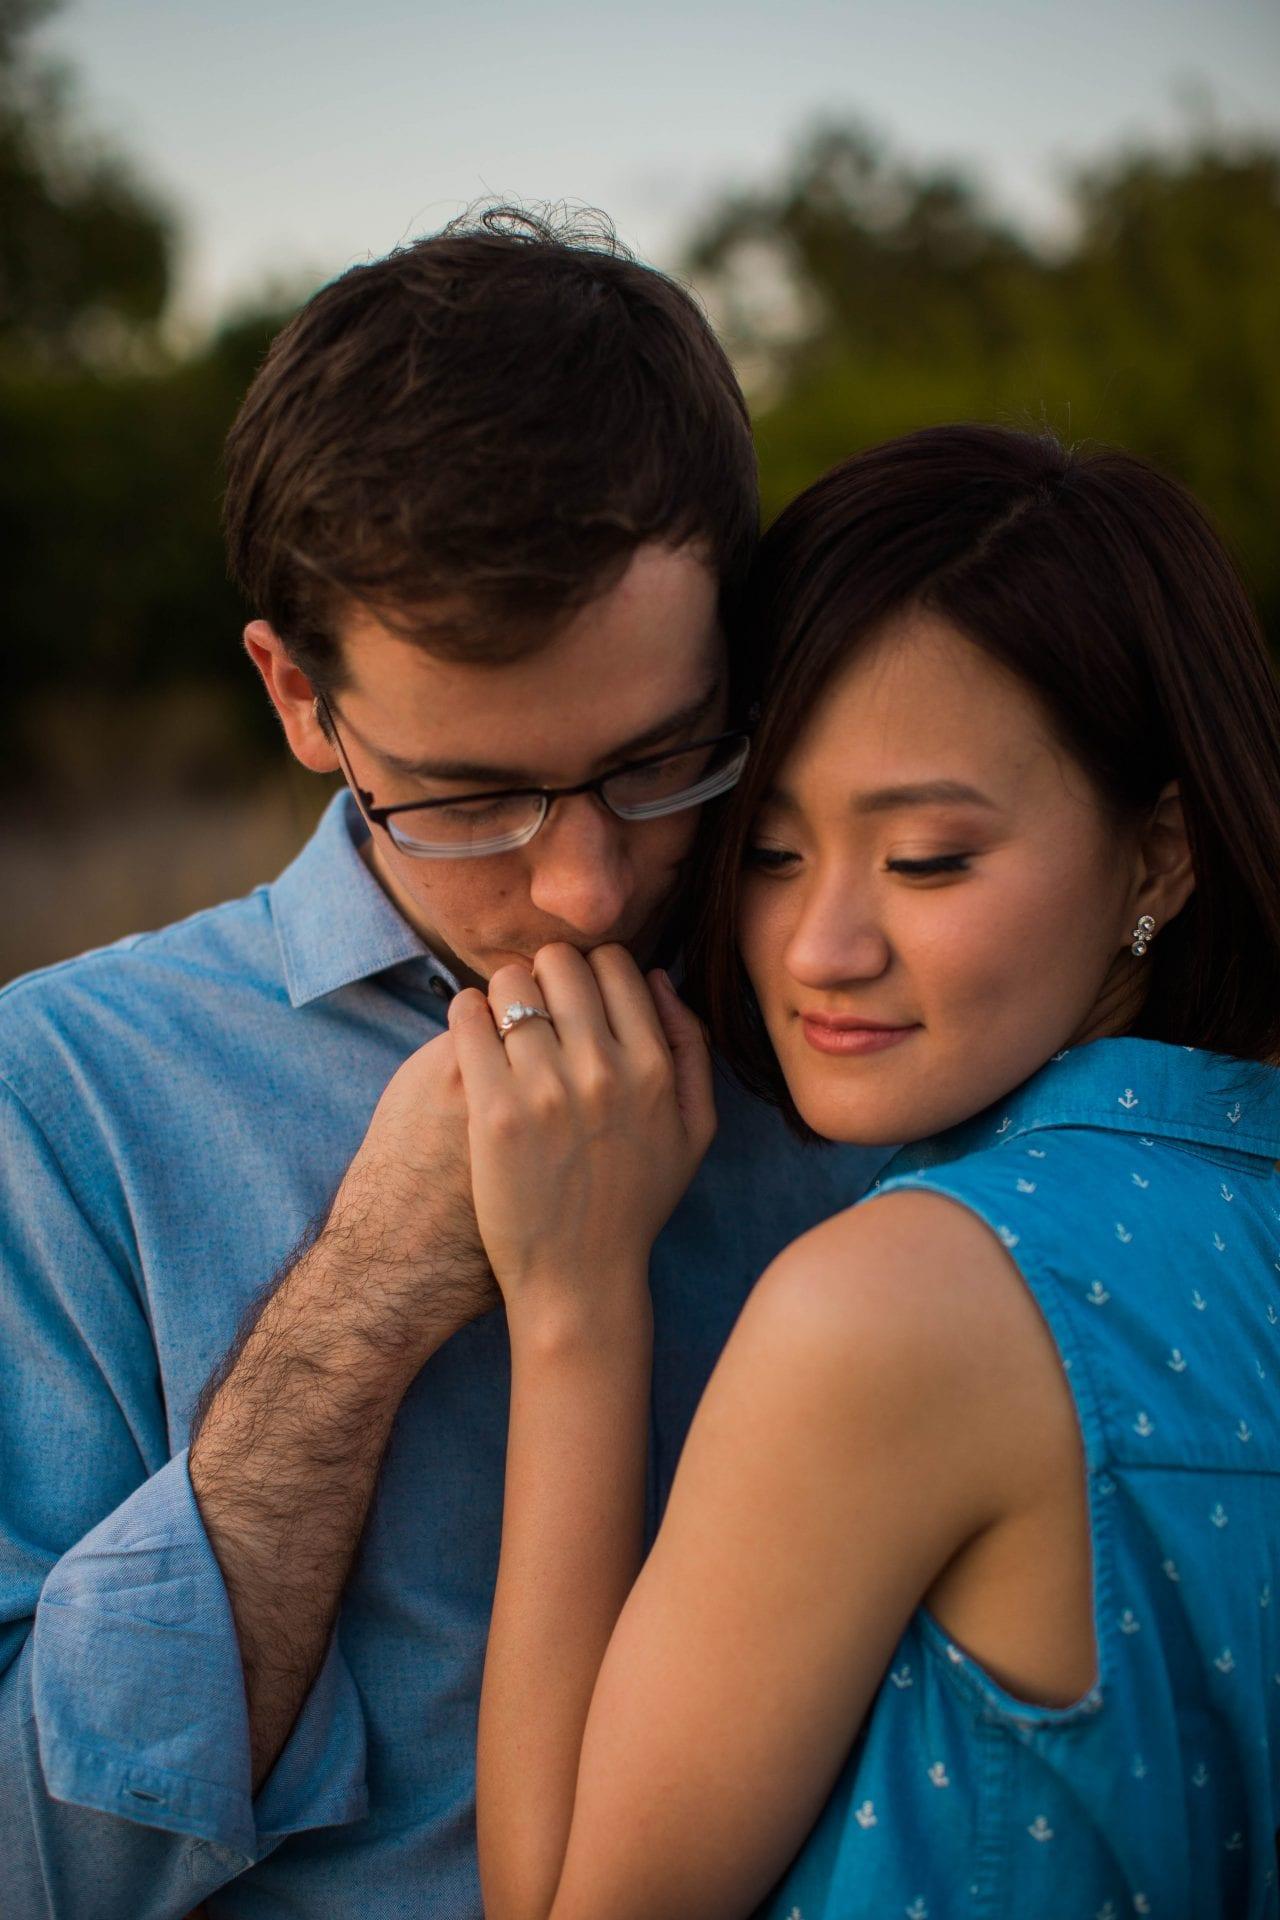 Josh and Tina engagement session at park hand kiss